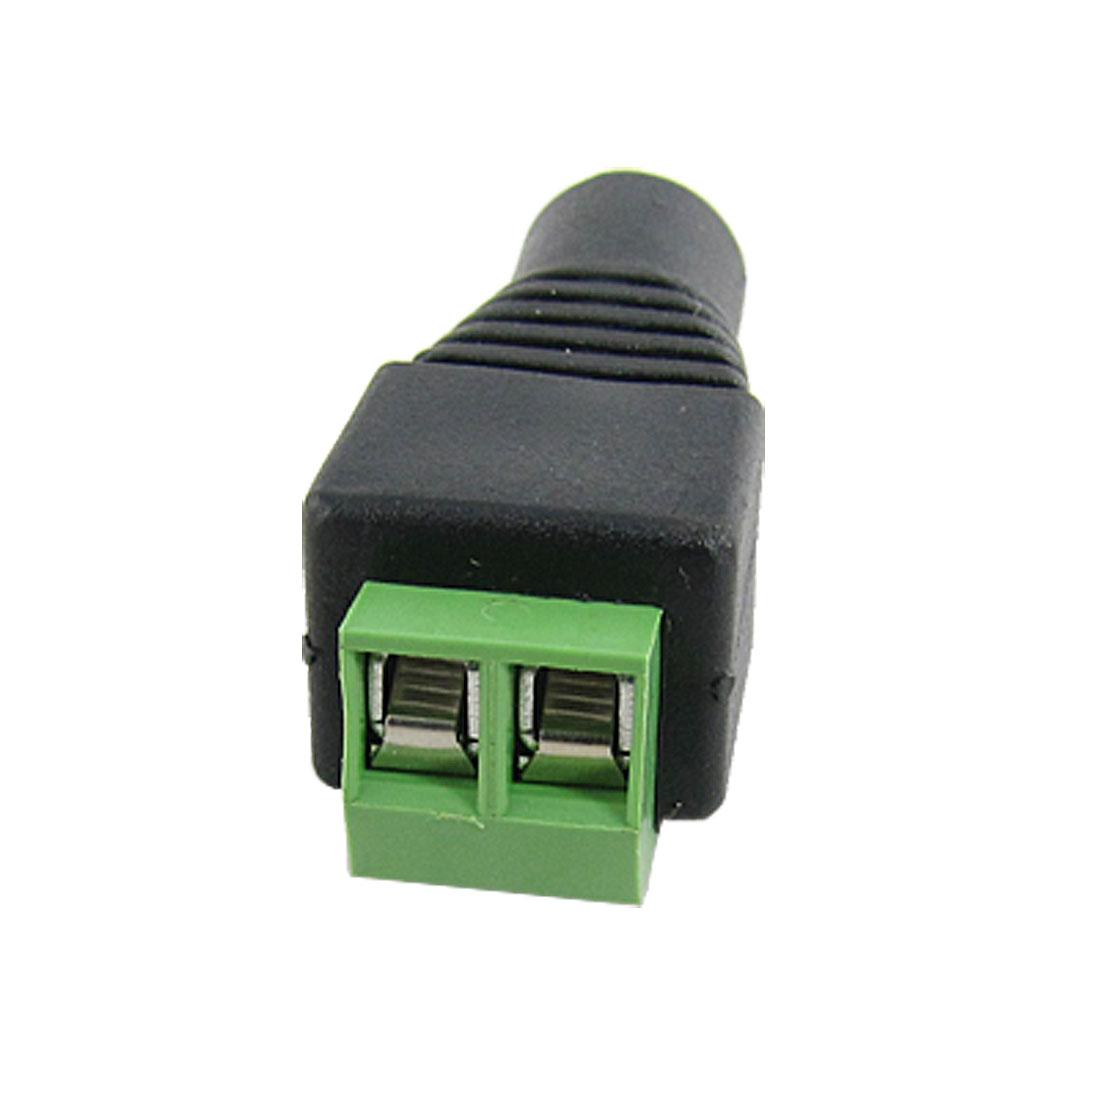 5.5 x 2.1mm DC Power Female Jack Connector Plug for CCTV Camera DVR